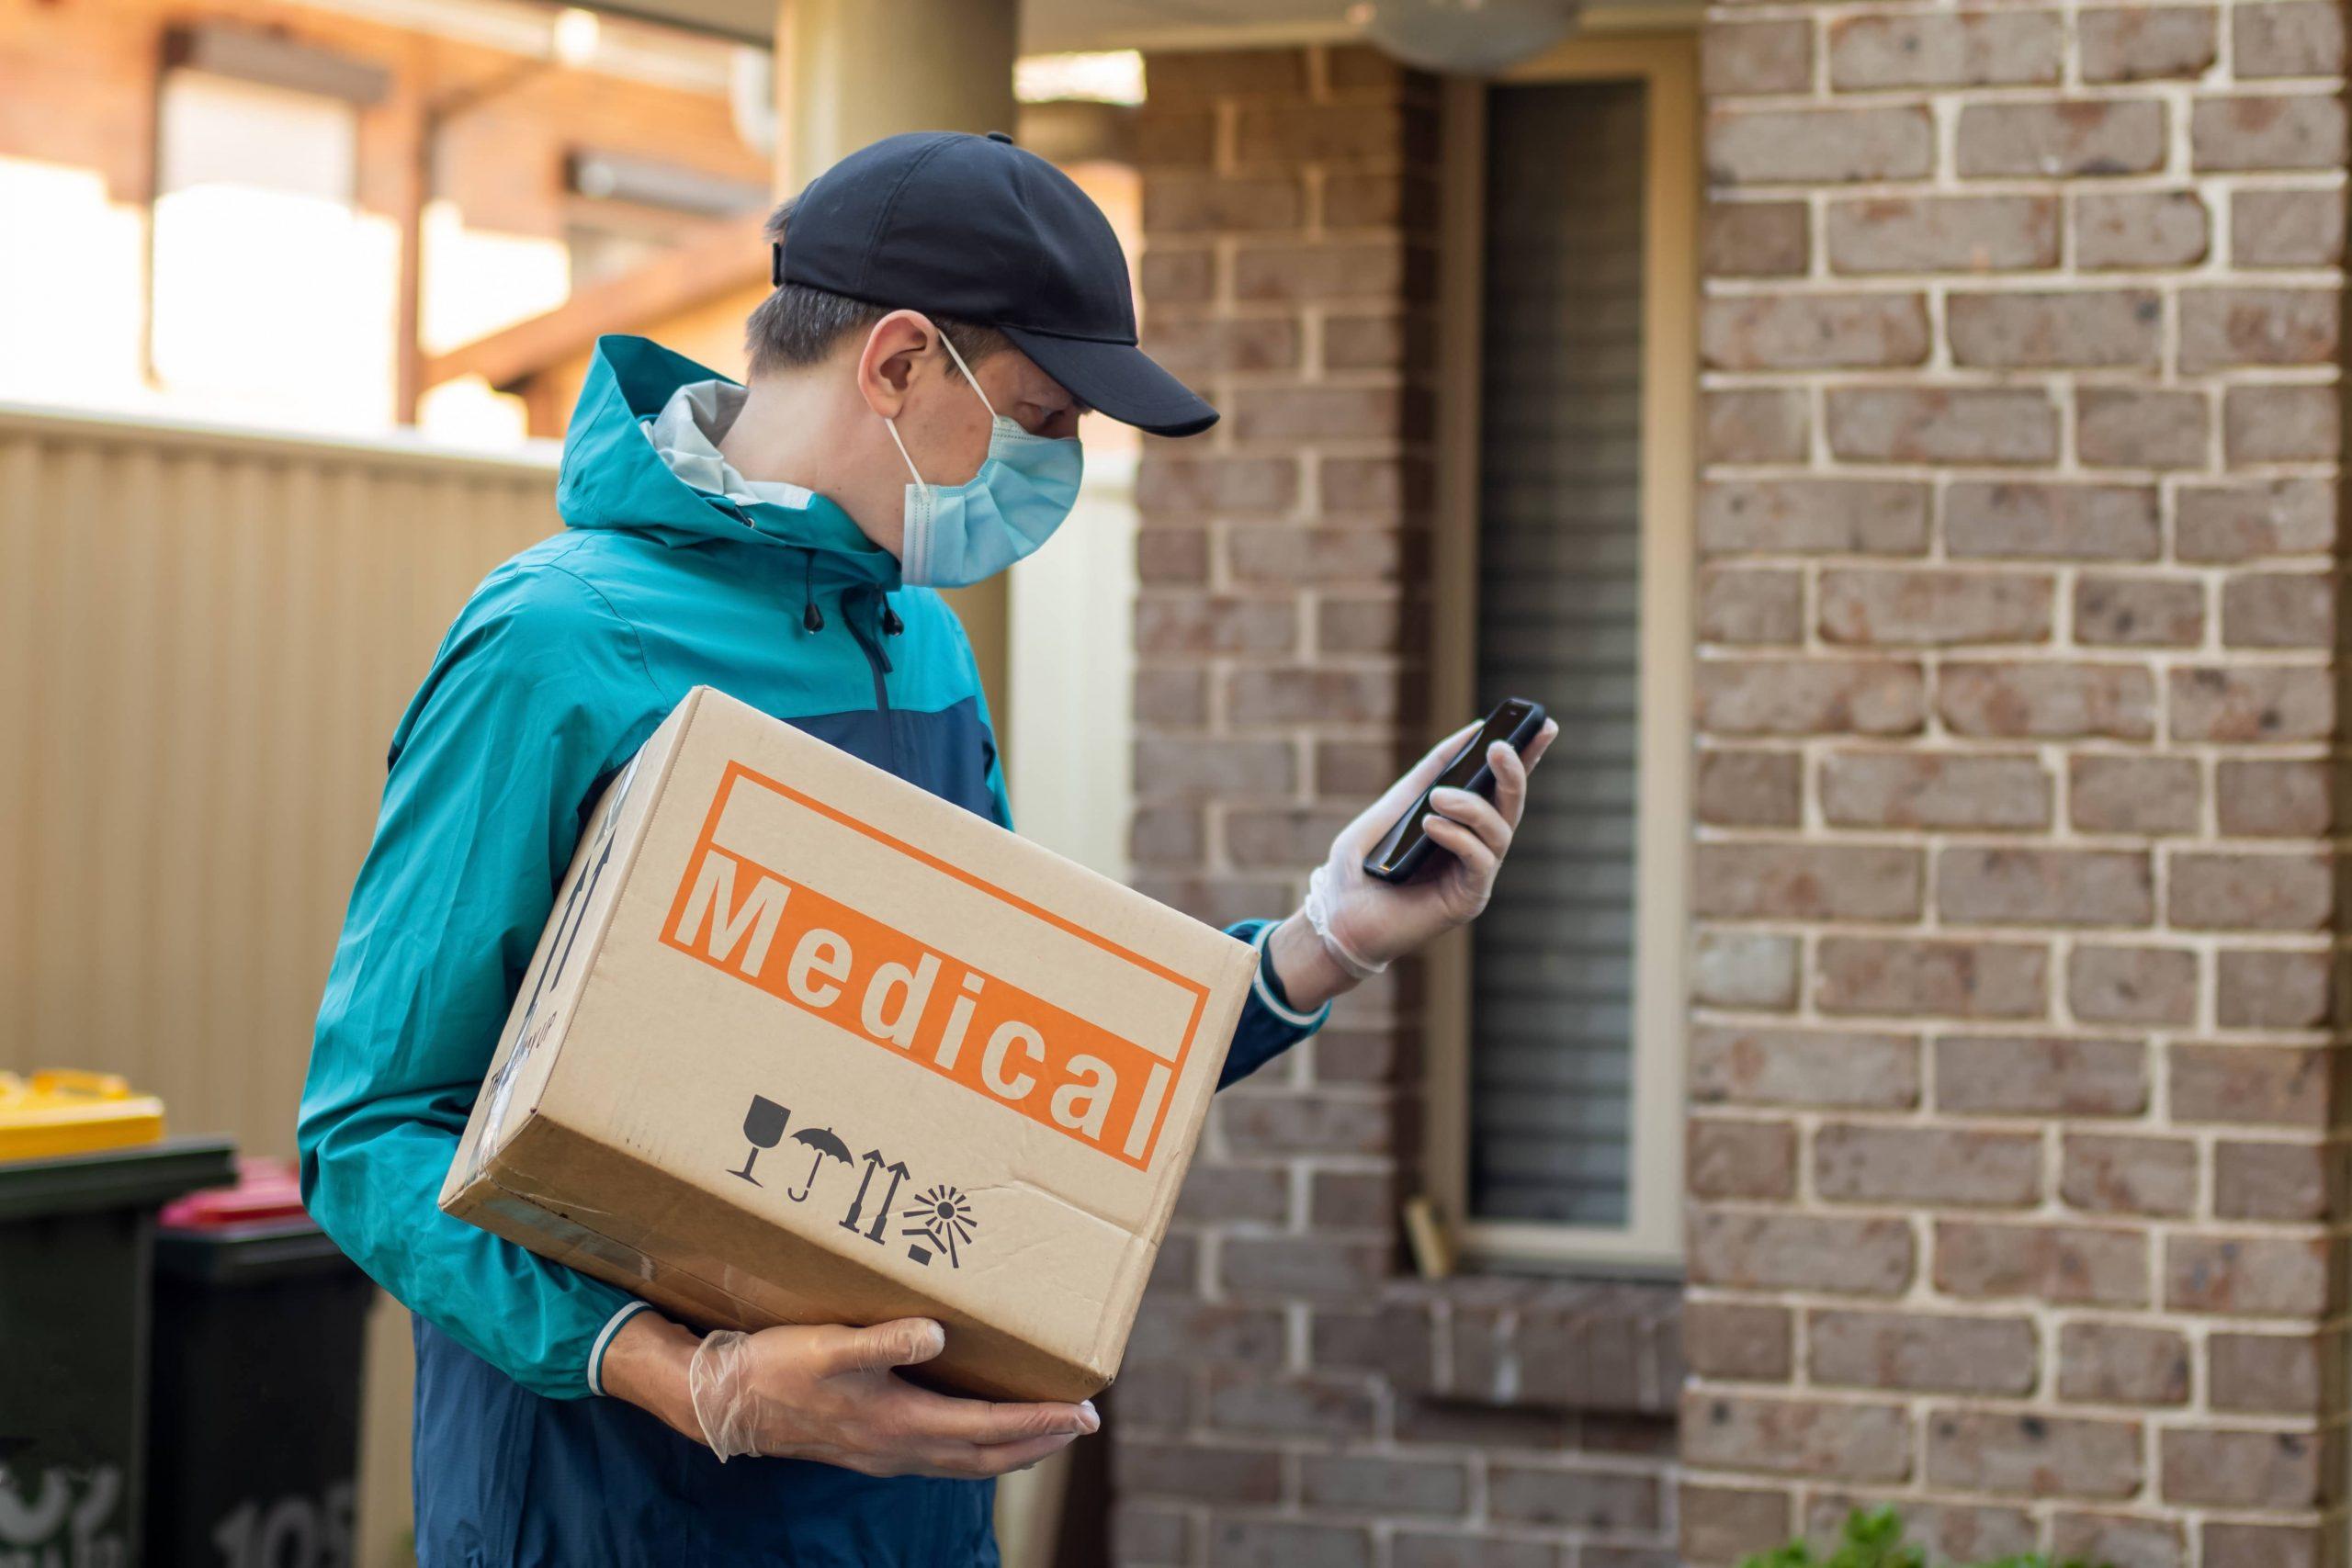 marketplace medicine delivery model